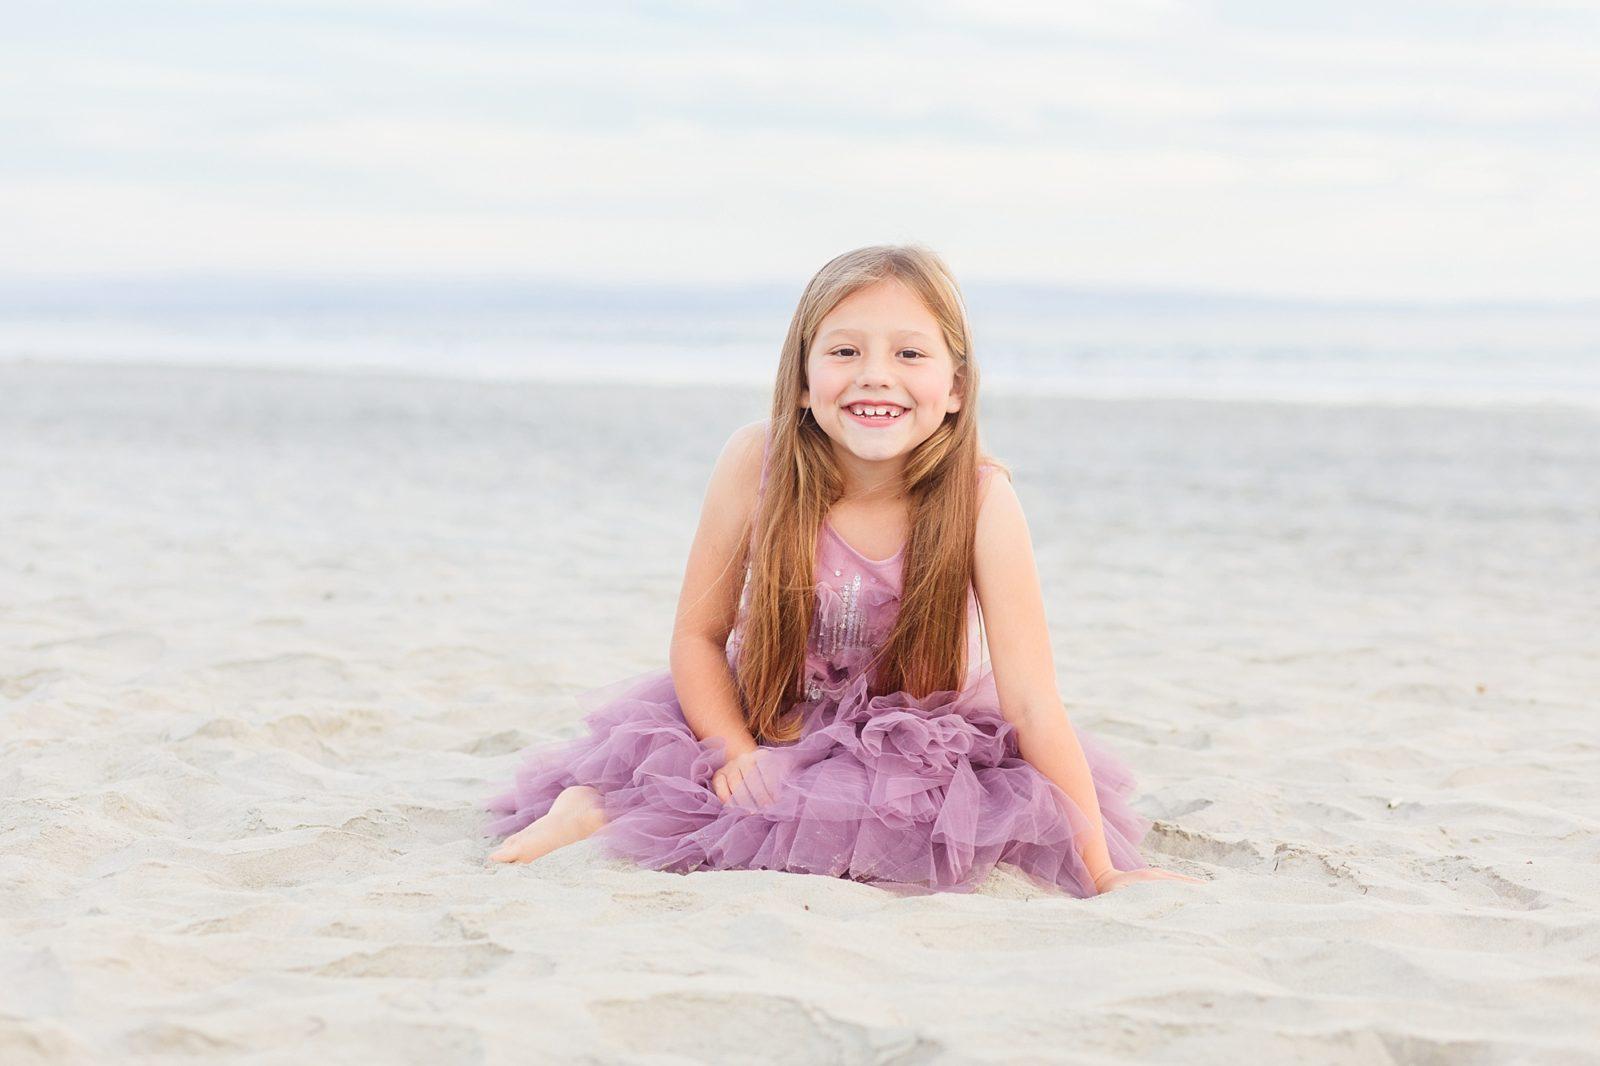 Child Photography San Diego | Hotel del Coronado Photographer